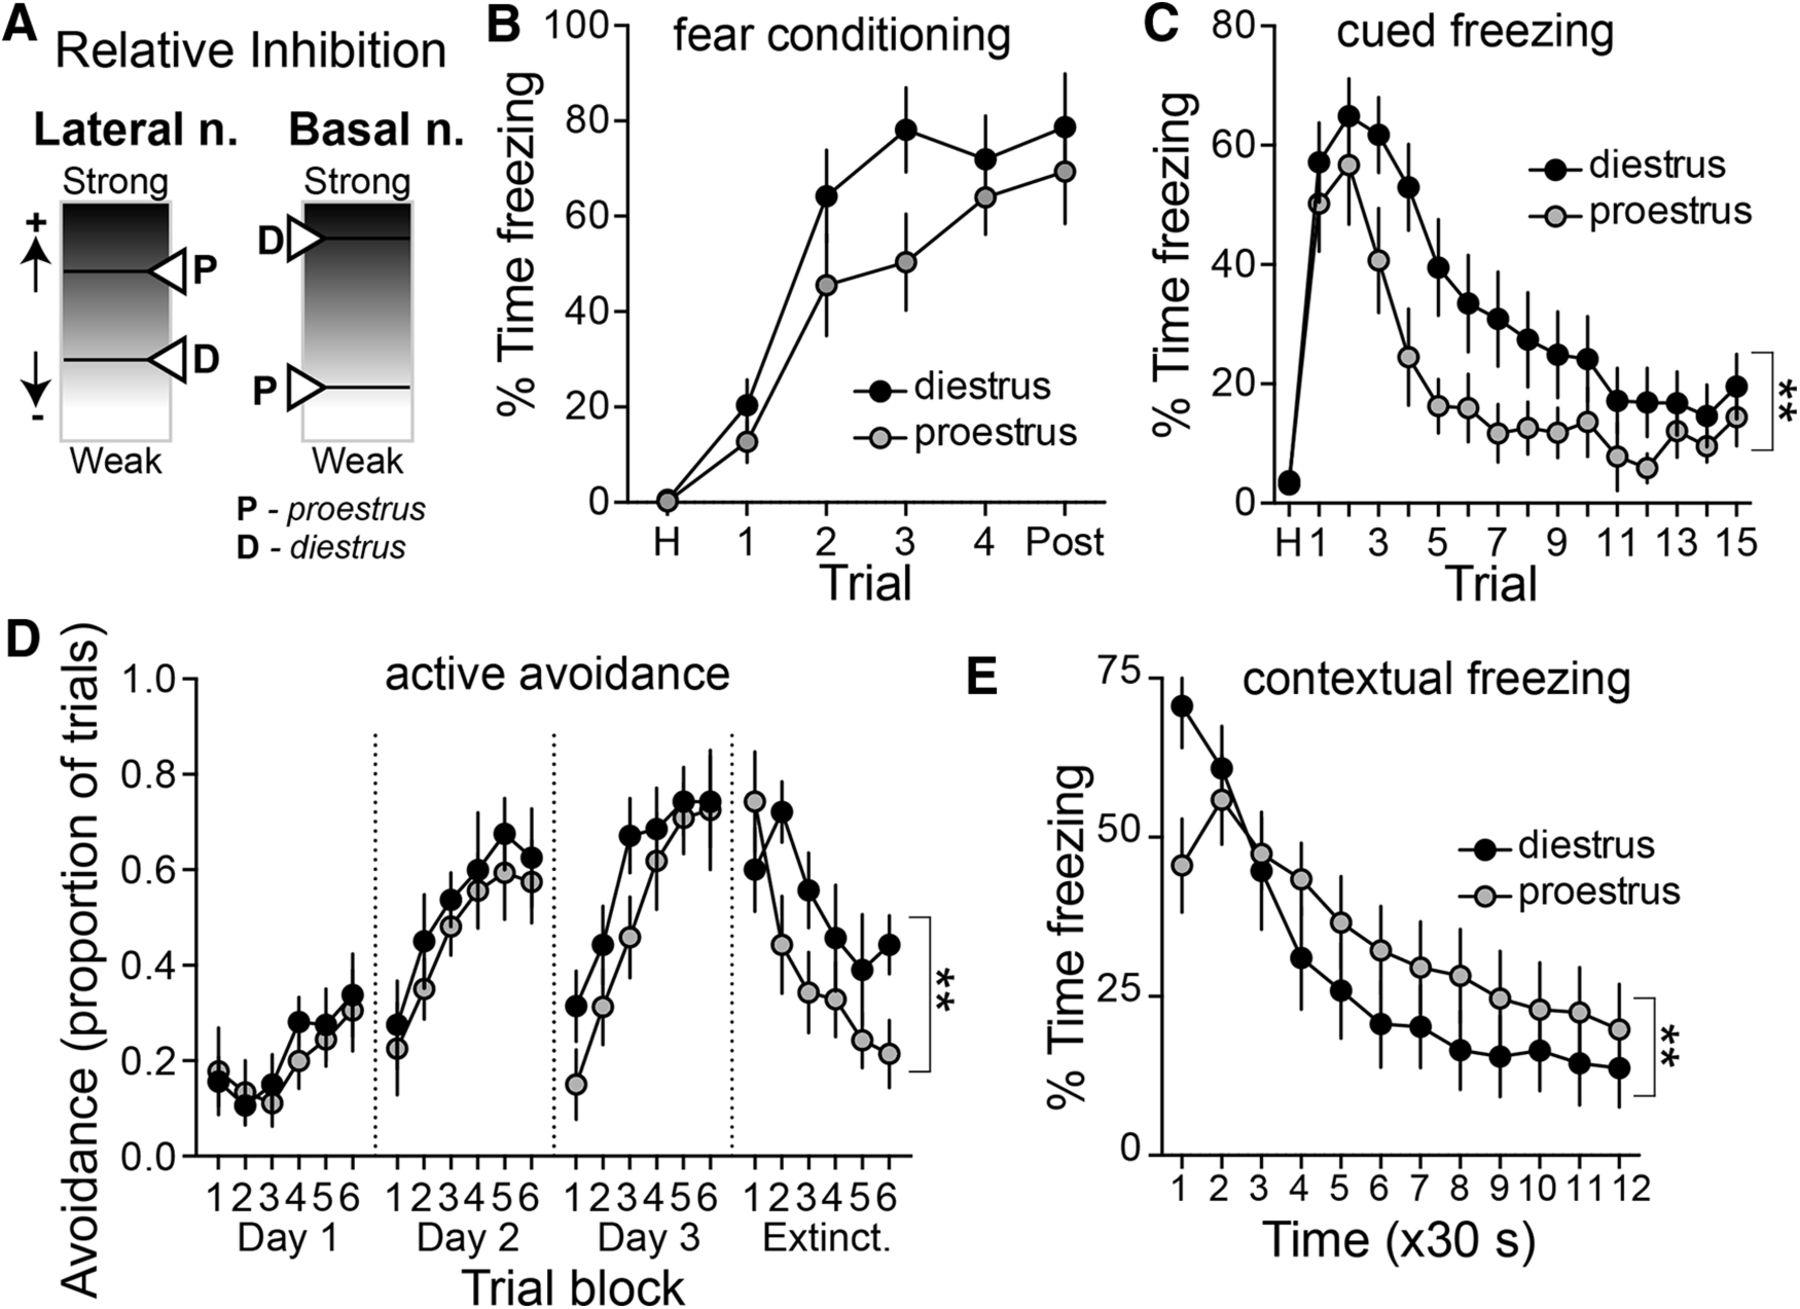 sex and estrus dependent differences in rat basolateral amygdala journal of neuroscience [ 1800 x 1309 Pixel ]